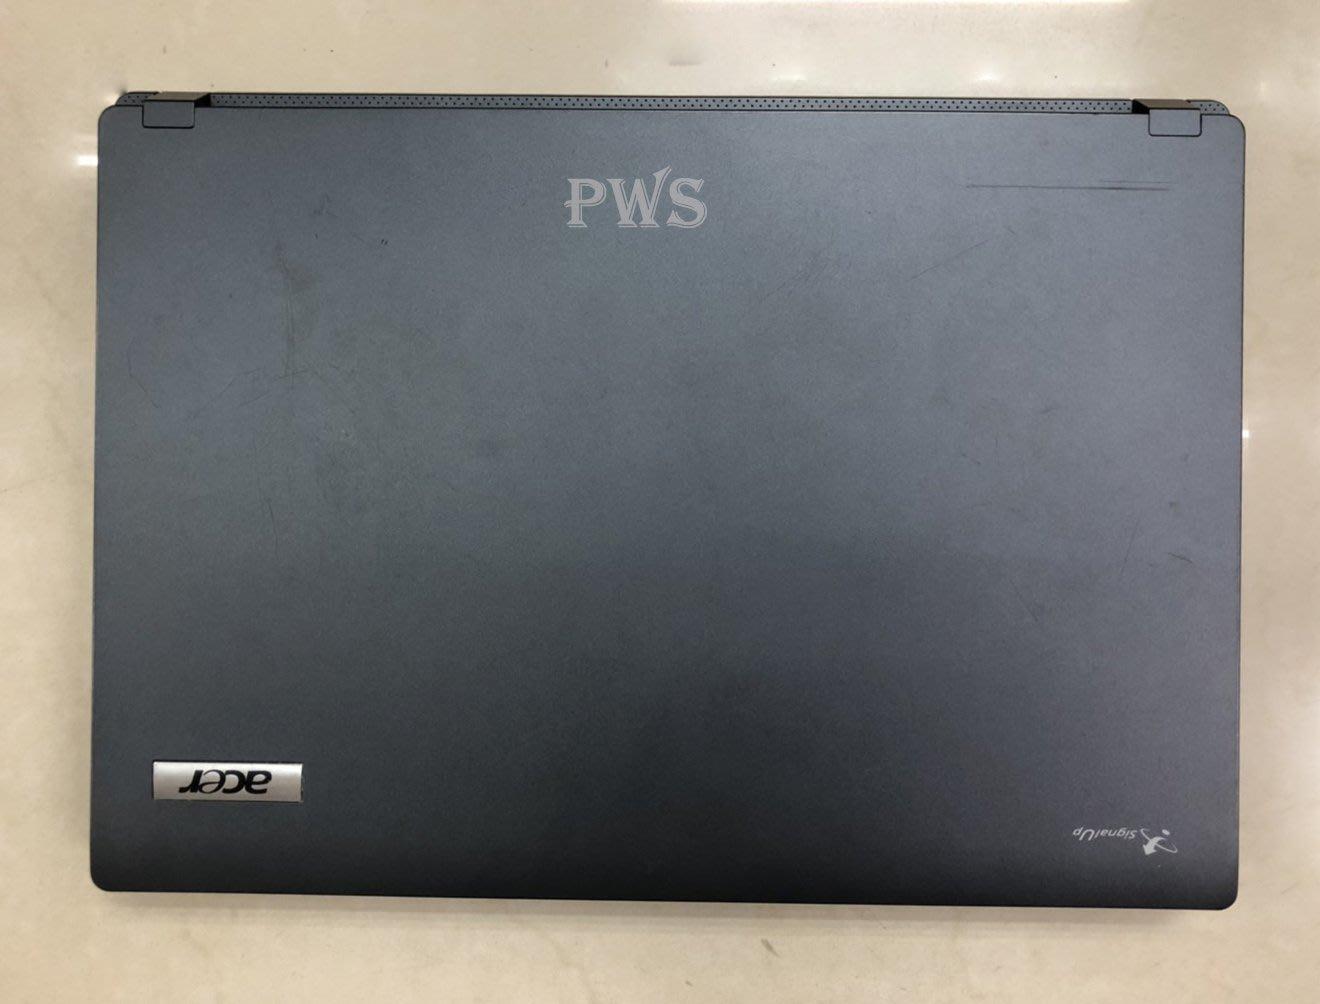 Acer Tm4750 Keyboard Travelmate P243 4750 I5 2450m Gt 520m